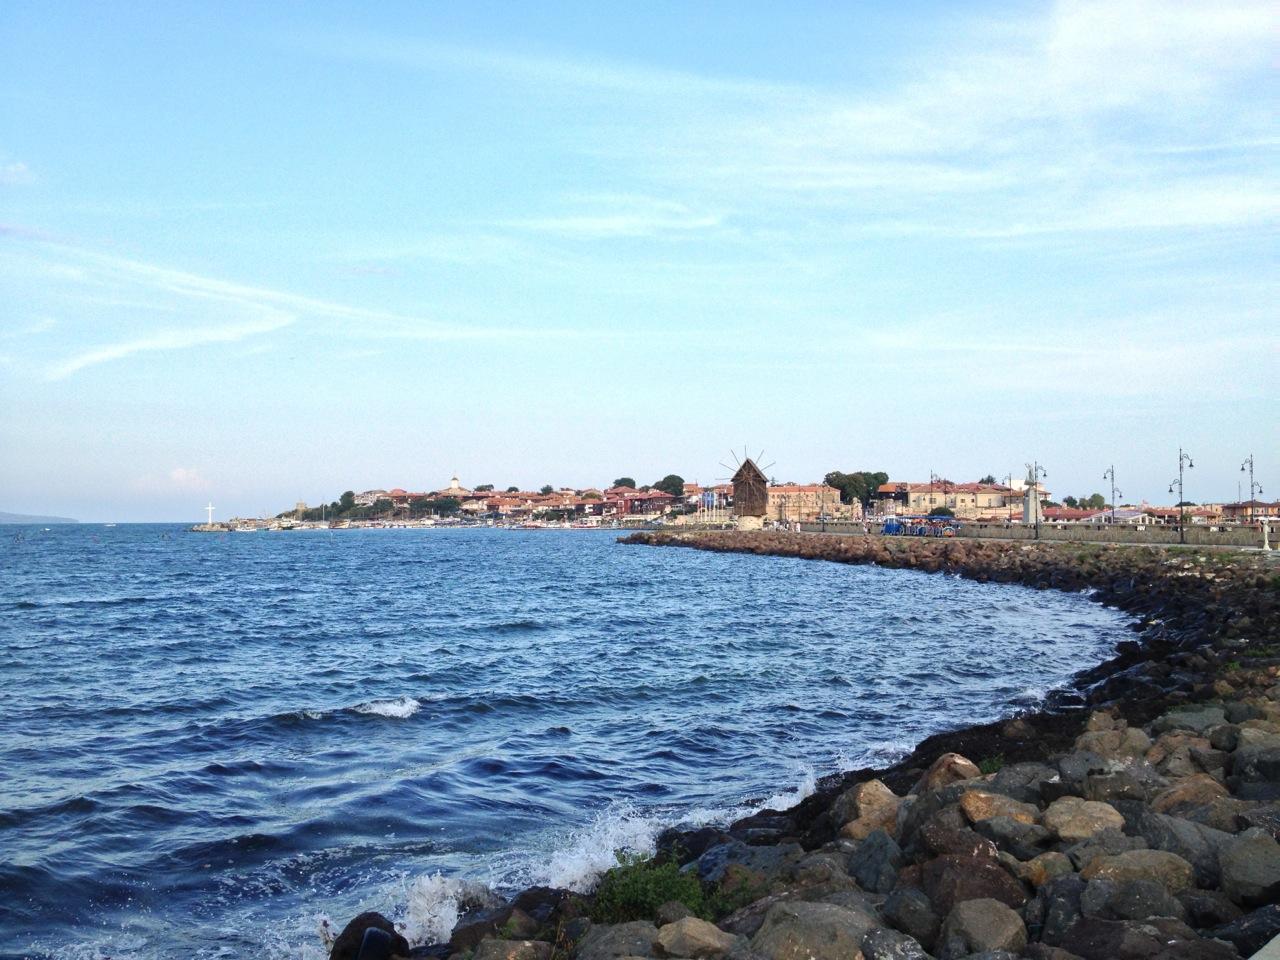 Nessebar Peninsula (ancient Messambria)